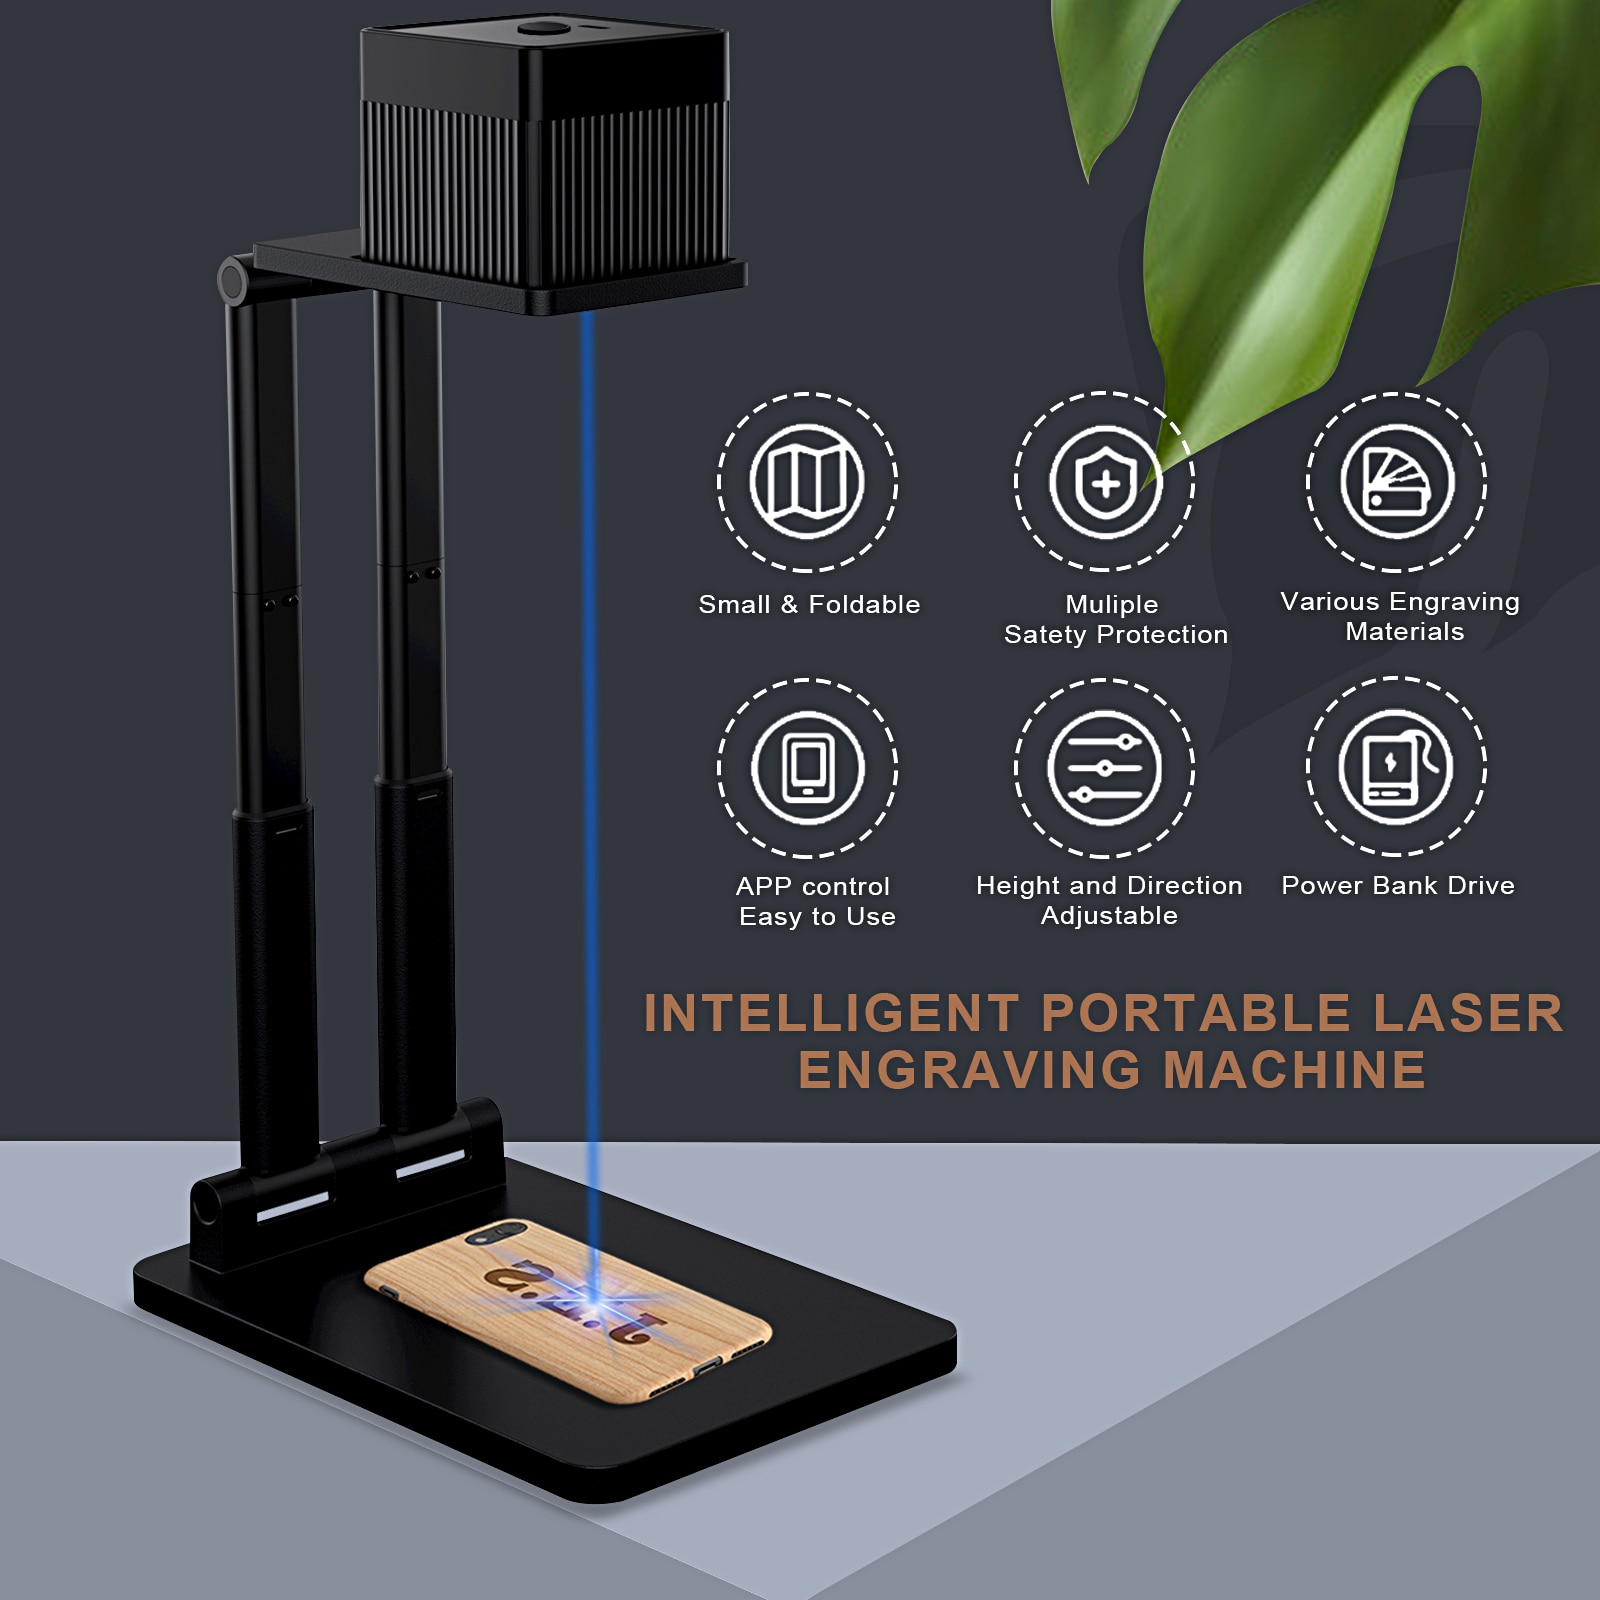 NEW LC100 Laser Engraver 3D Printer Engraving Machine Desktop Etcher Cutter Engraver with Bracket Portable With Bluetooth enlarge